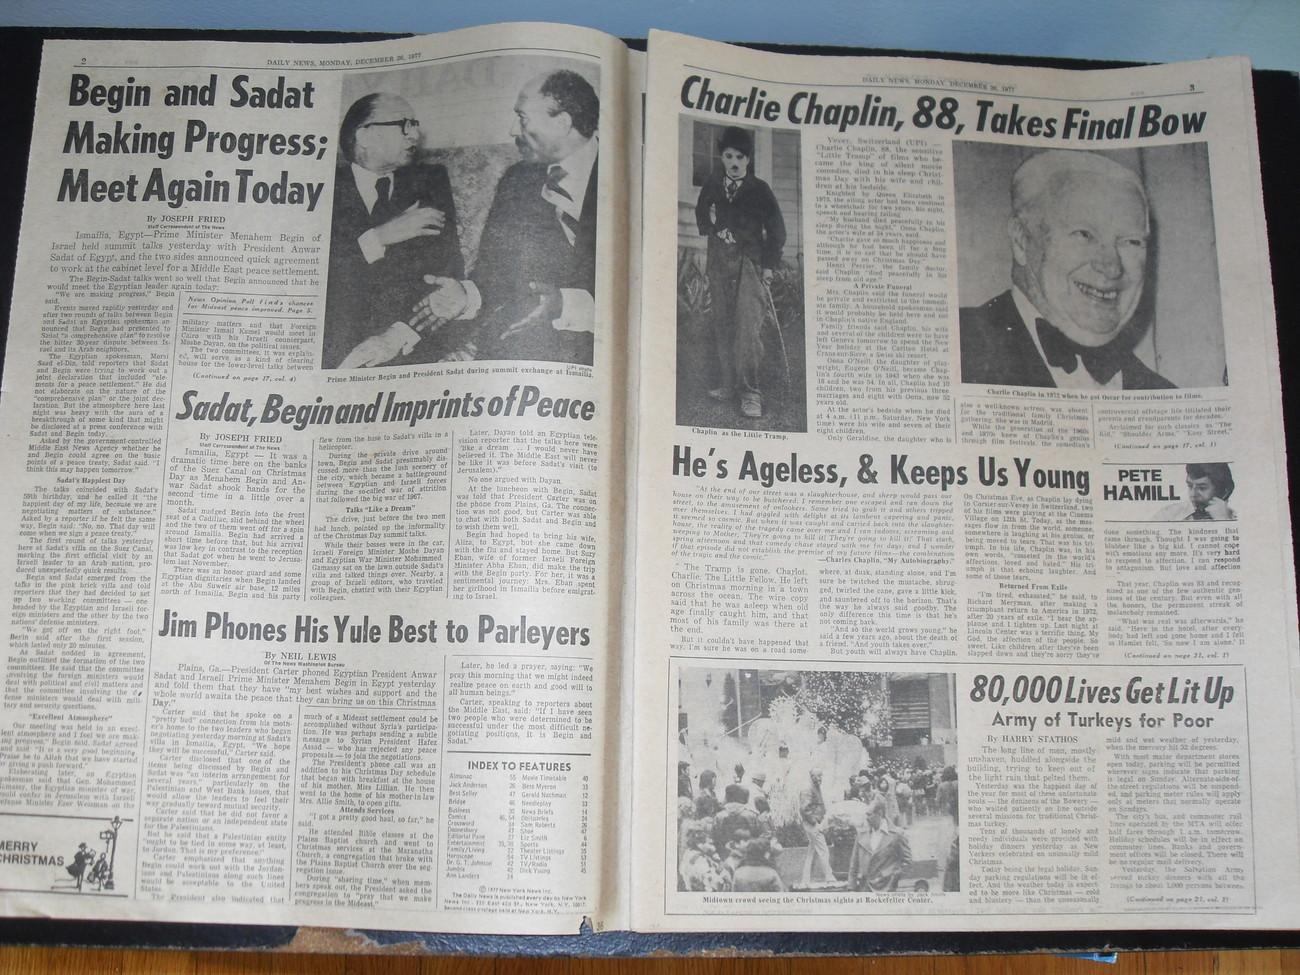 Daily News December 26 1977 Charlie Chaplin Dies 88 & More